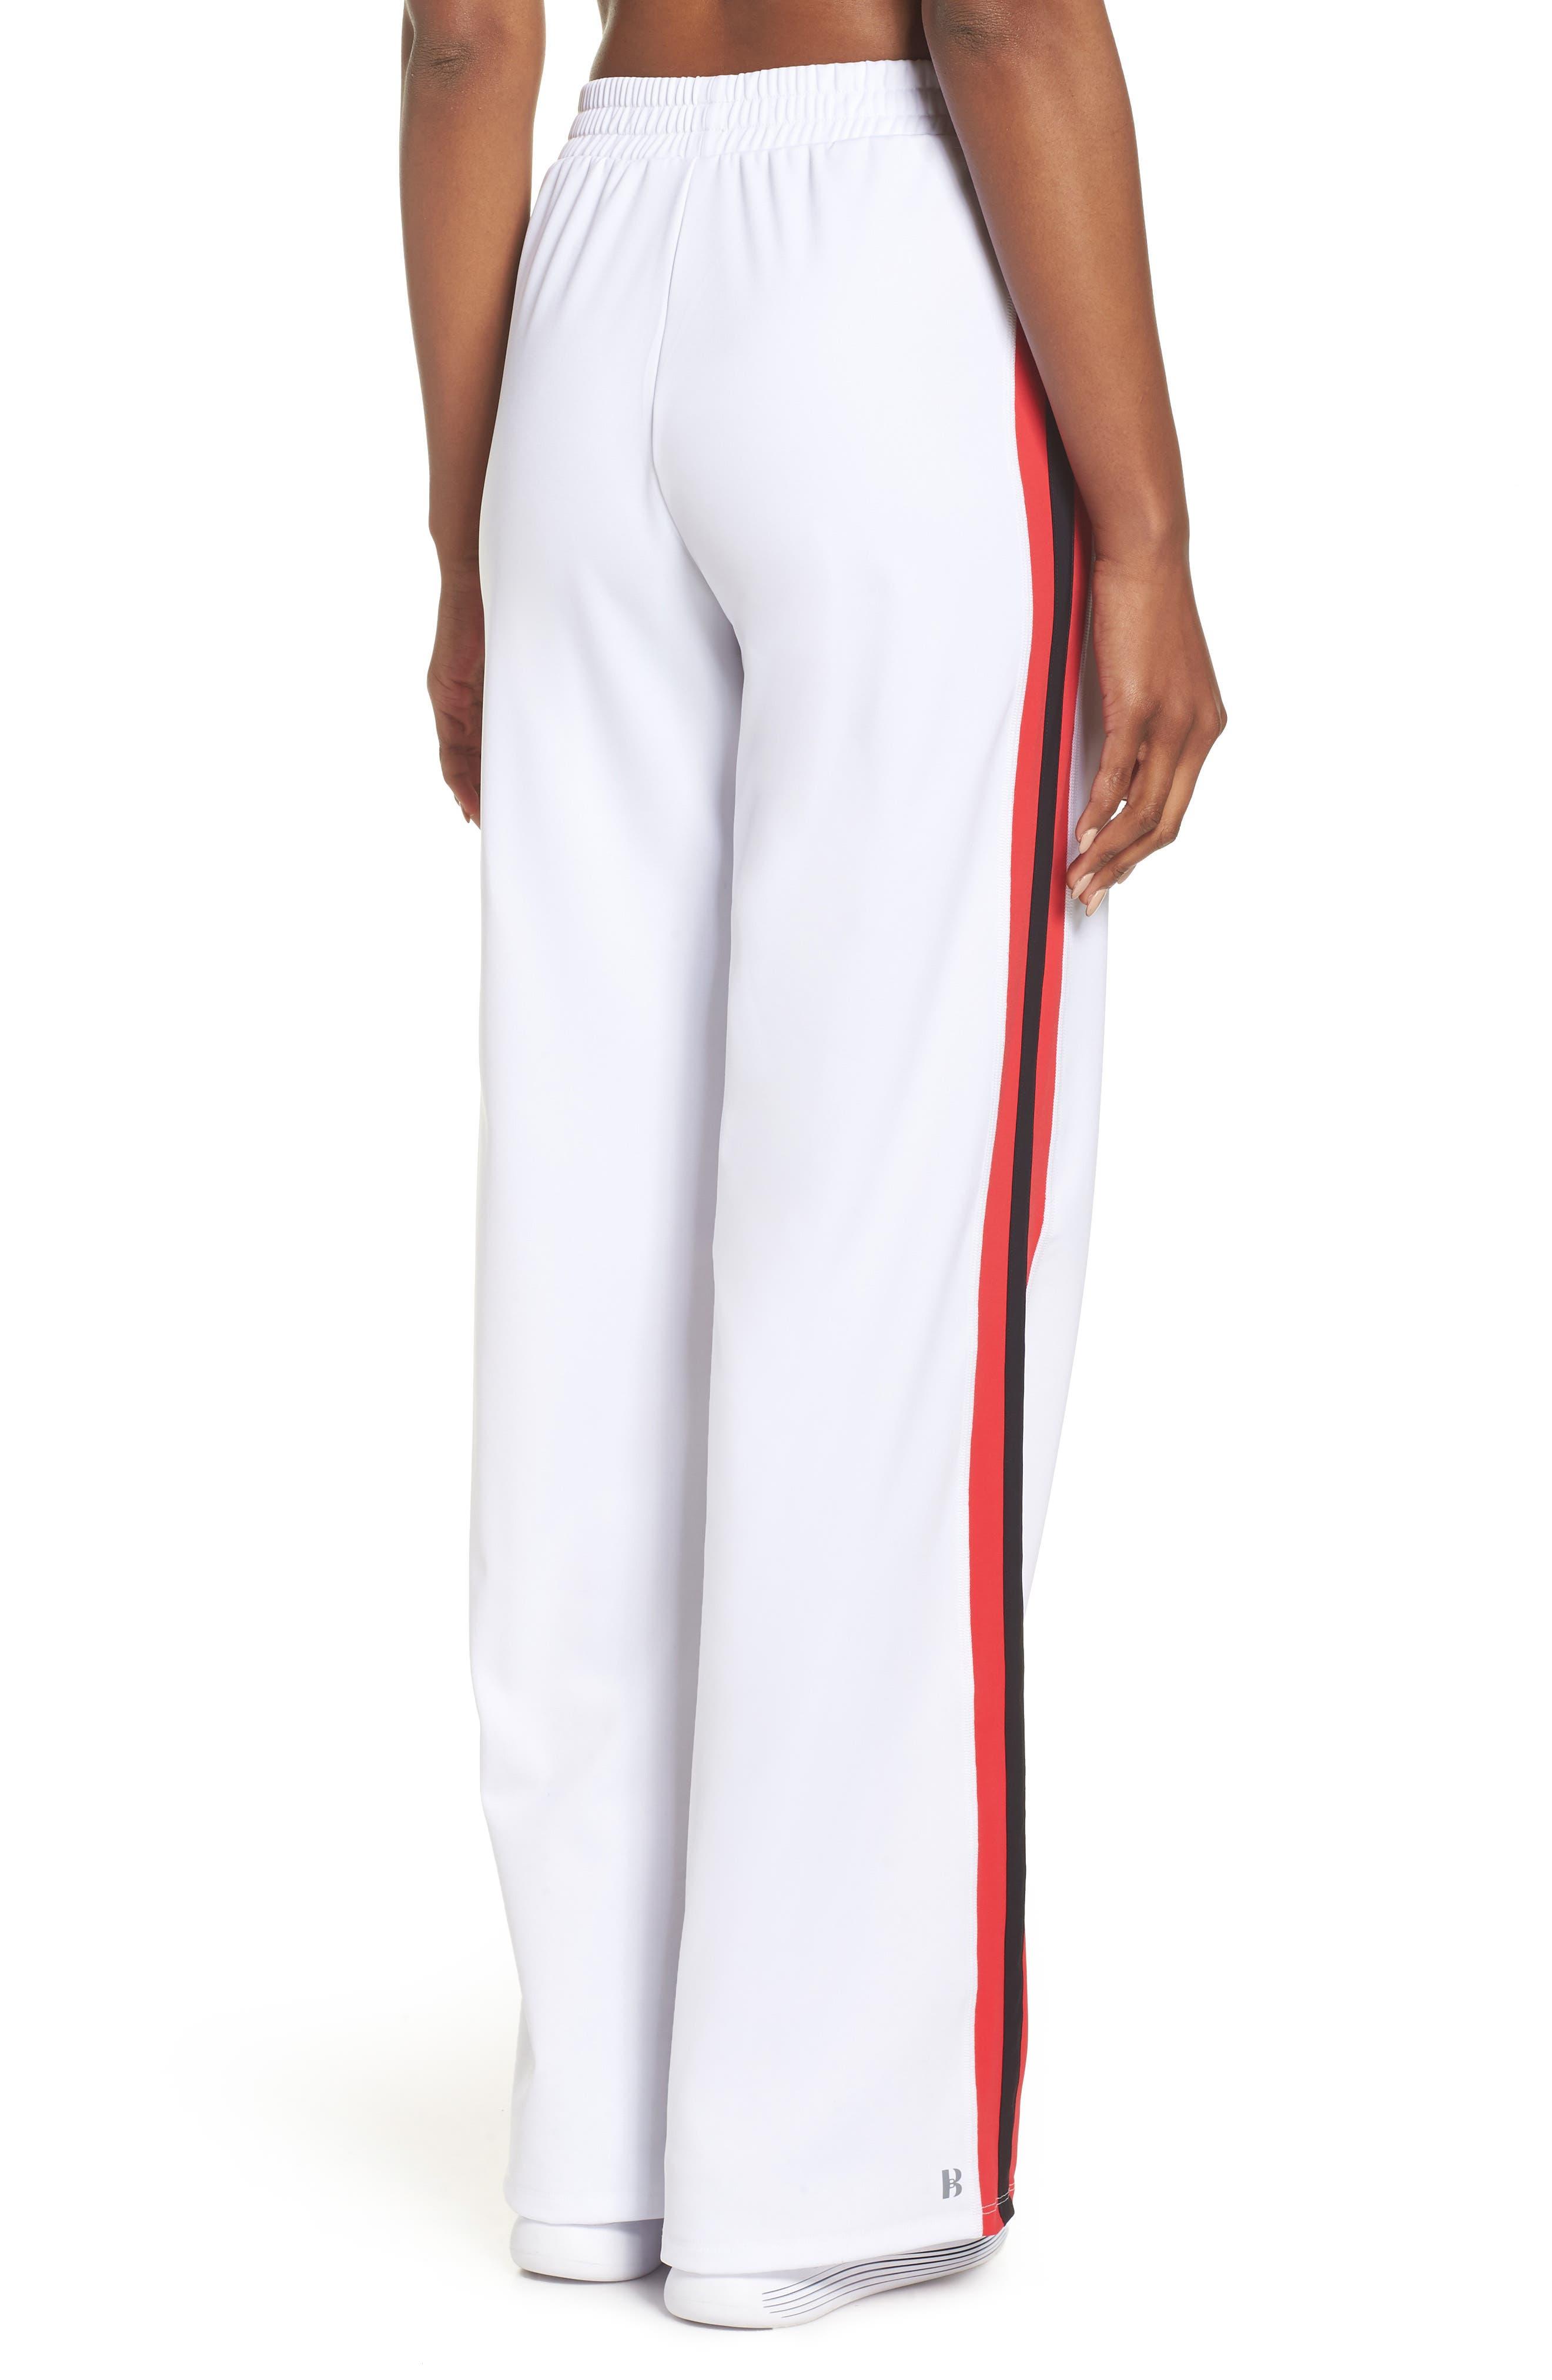 Wide Leg Track Pants,                             Alternate thumbnail 2, color,                             White/ Red/ Black